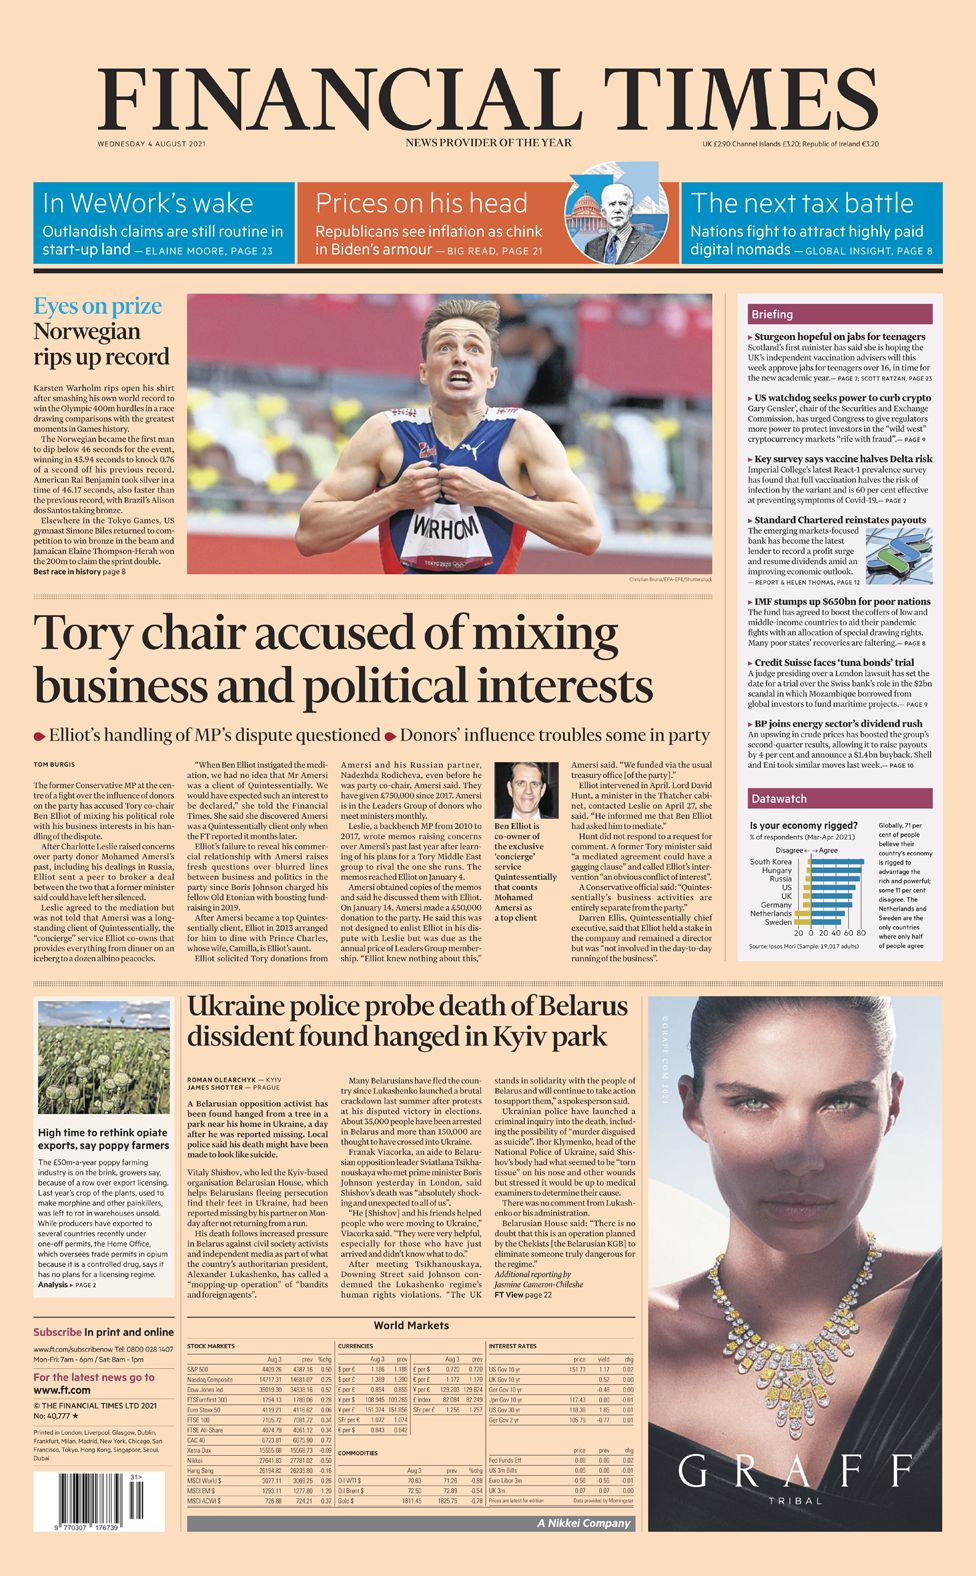 Financial Times - 04/08/21